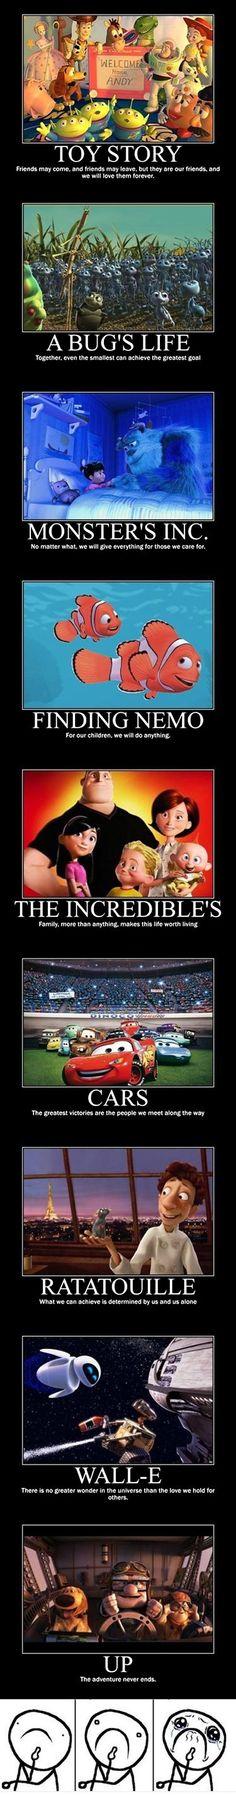 Things Pixar Taught Me